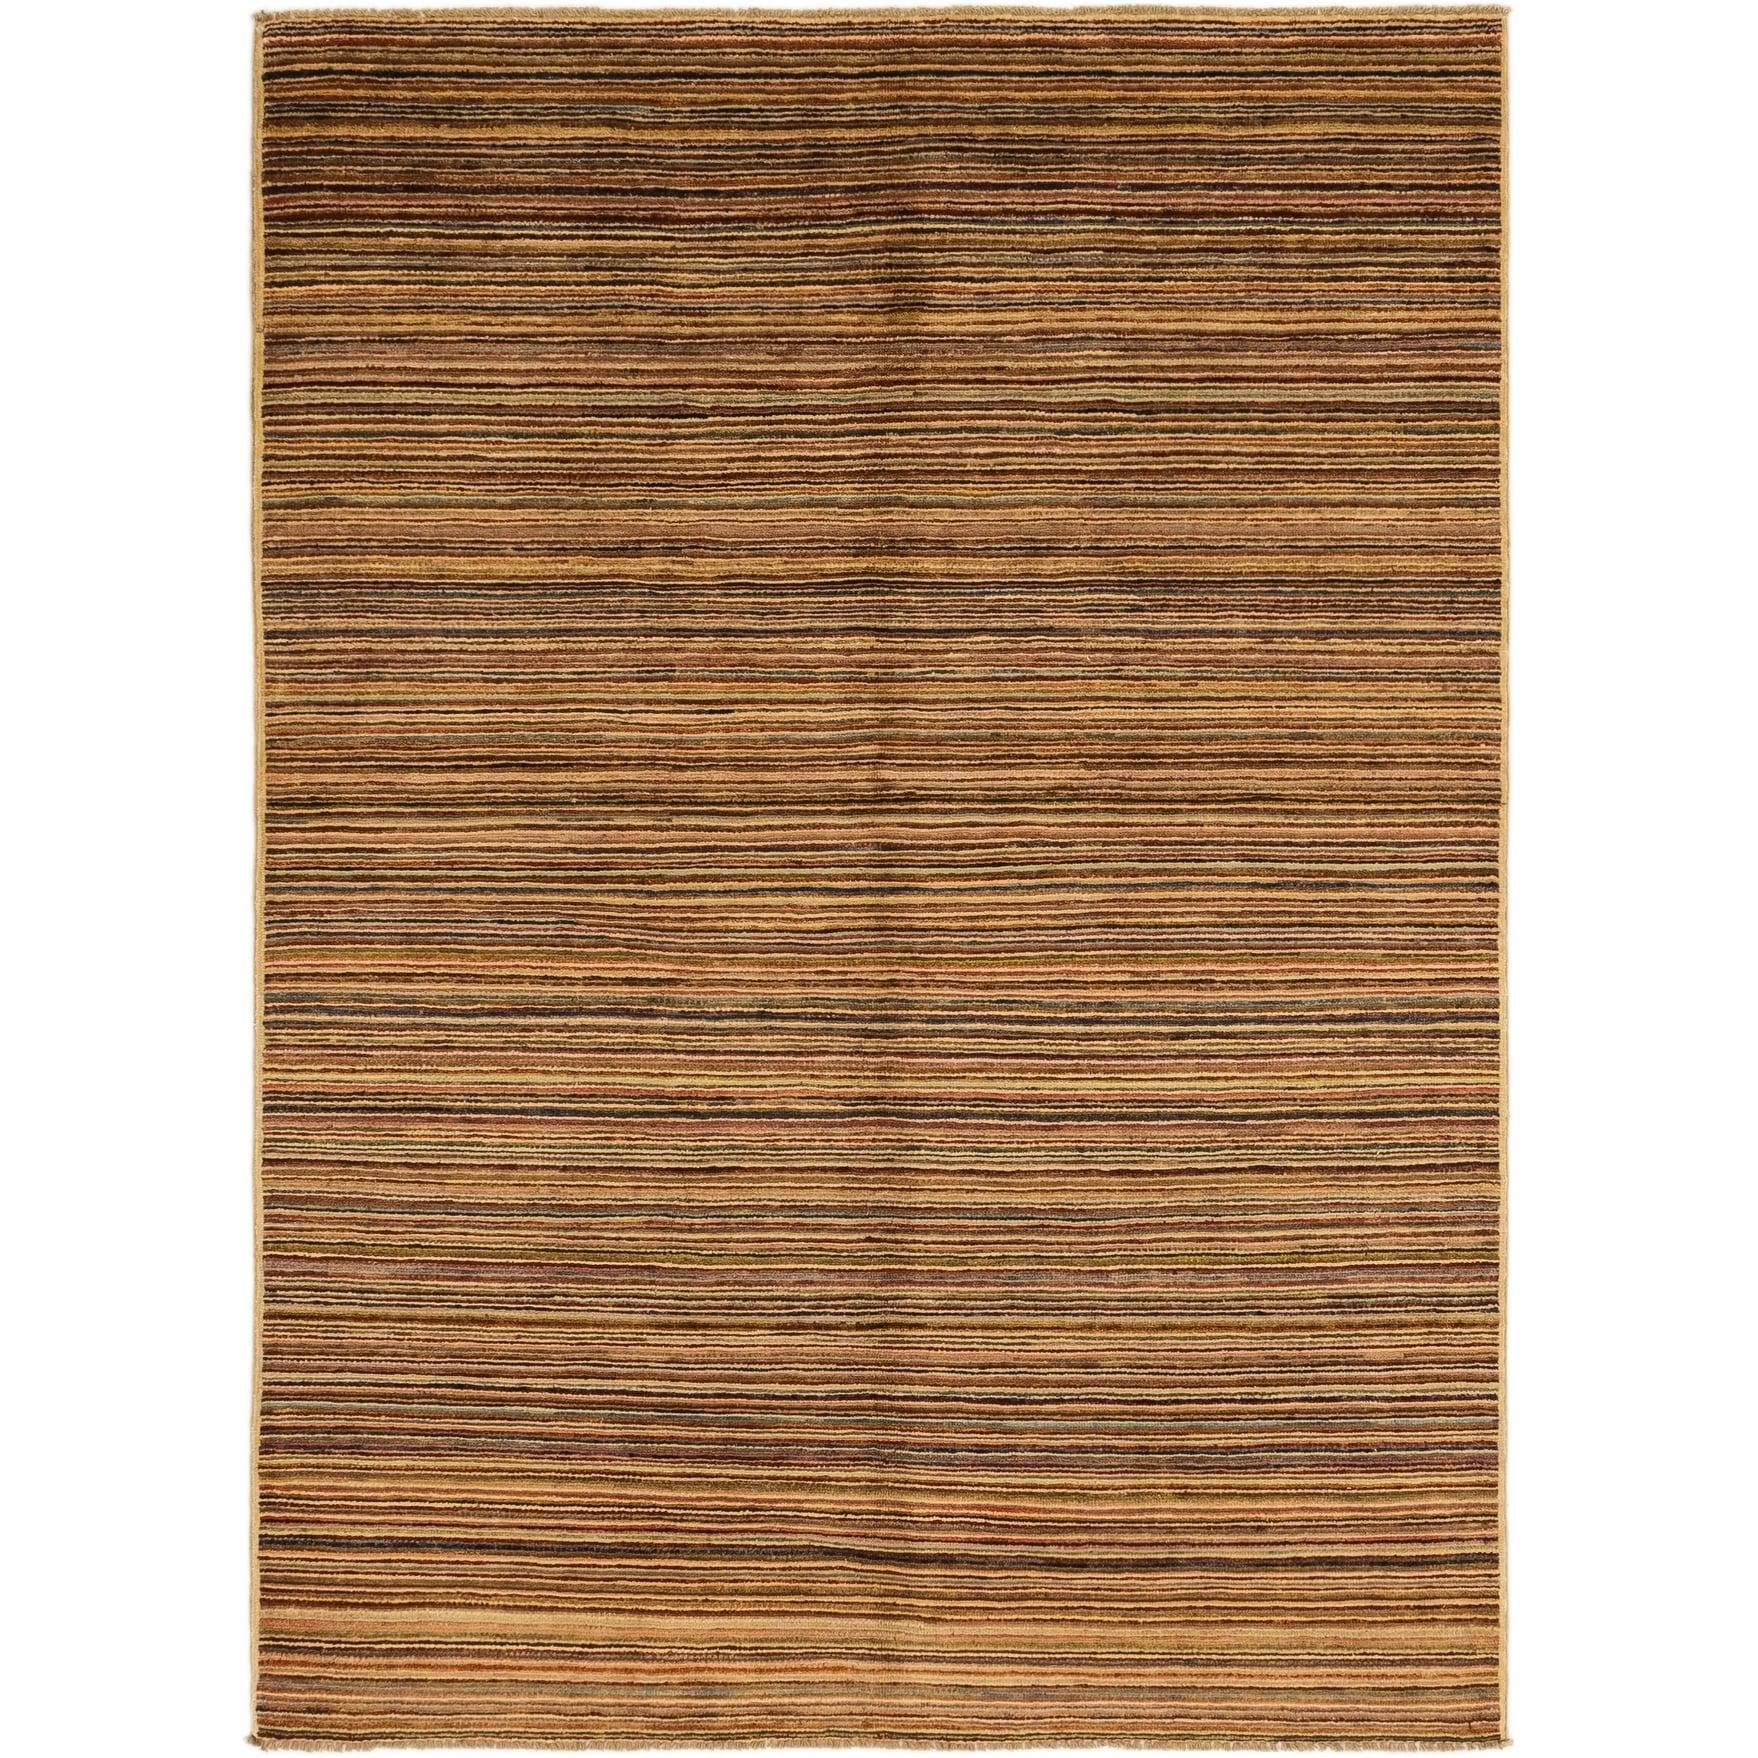 Hand Knotted Kashkuli Gabbeh Wool Area Rug - 5 3 x 7 4 (Multi - 5 3 x 7 4)